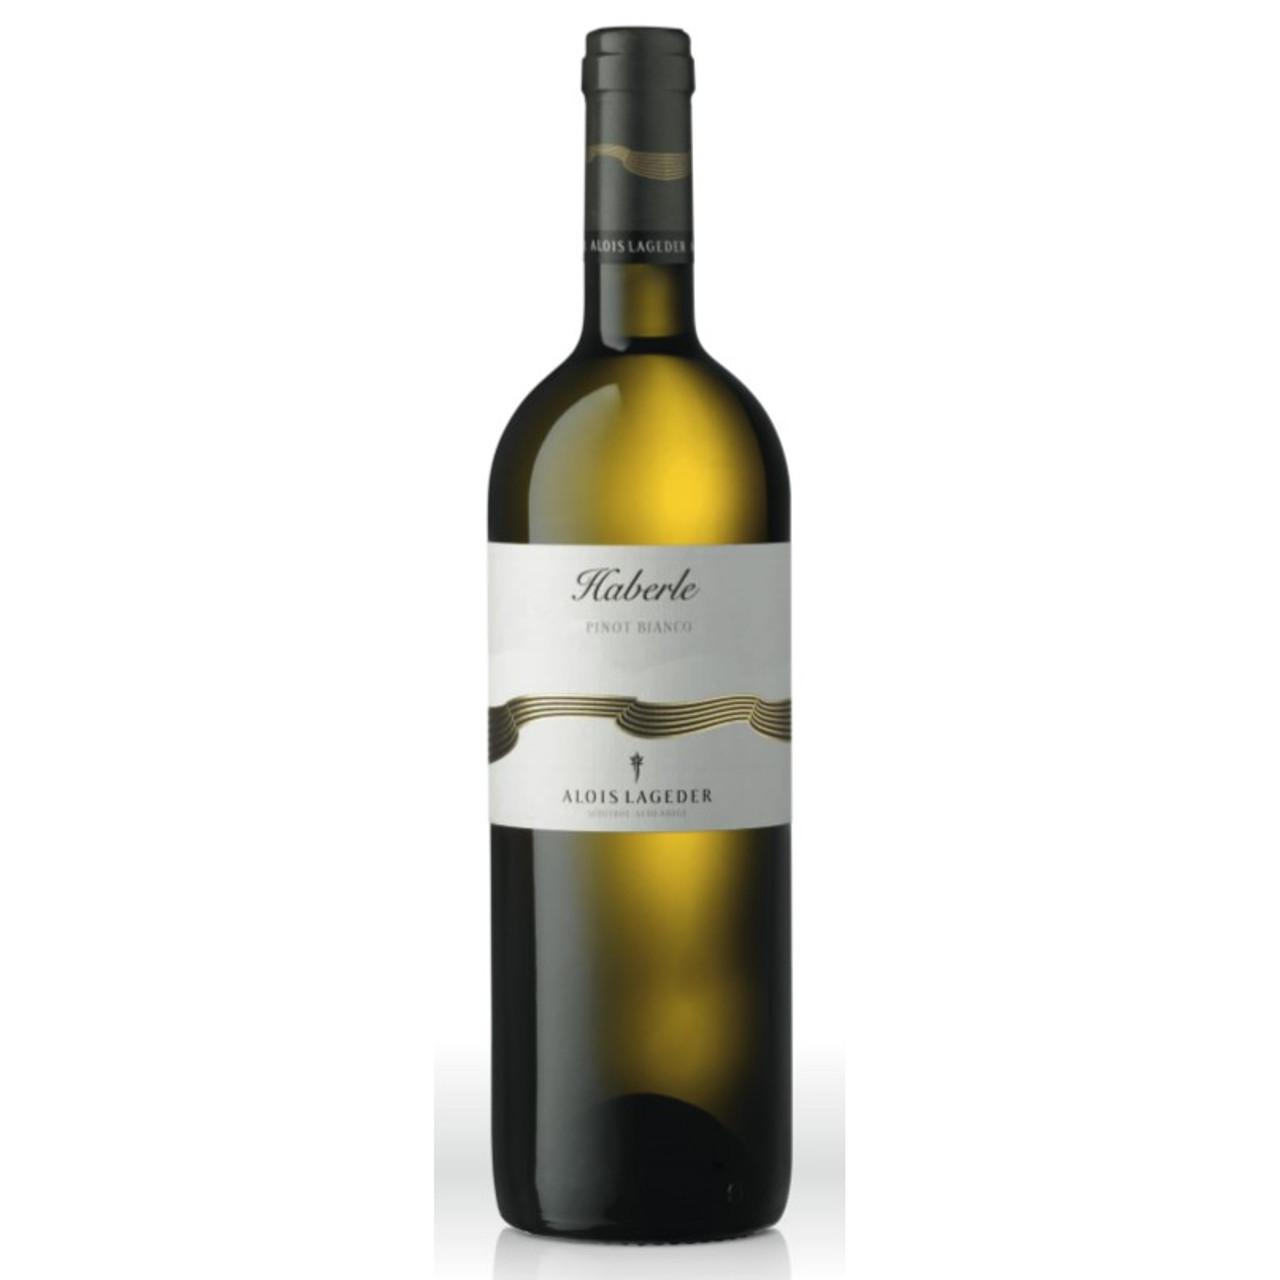 Alois Lageder, Pinot Bianco, 'Haberle', Alto Adige DOC 2015